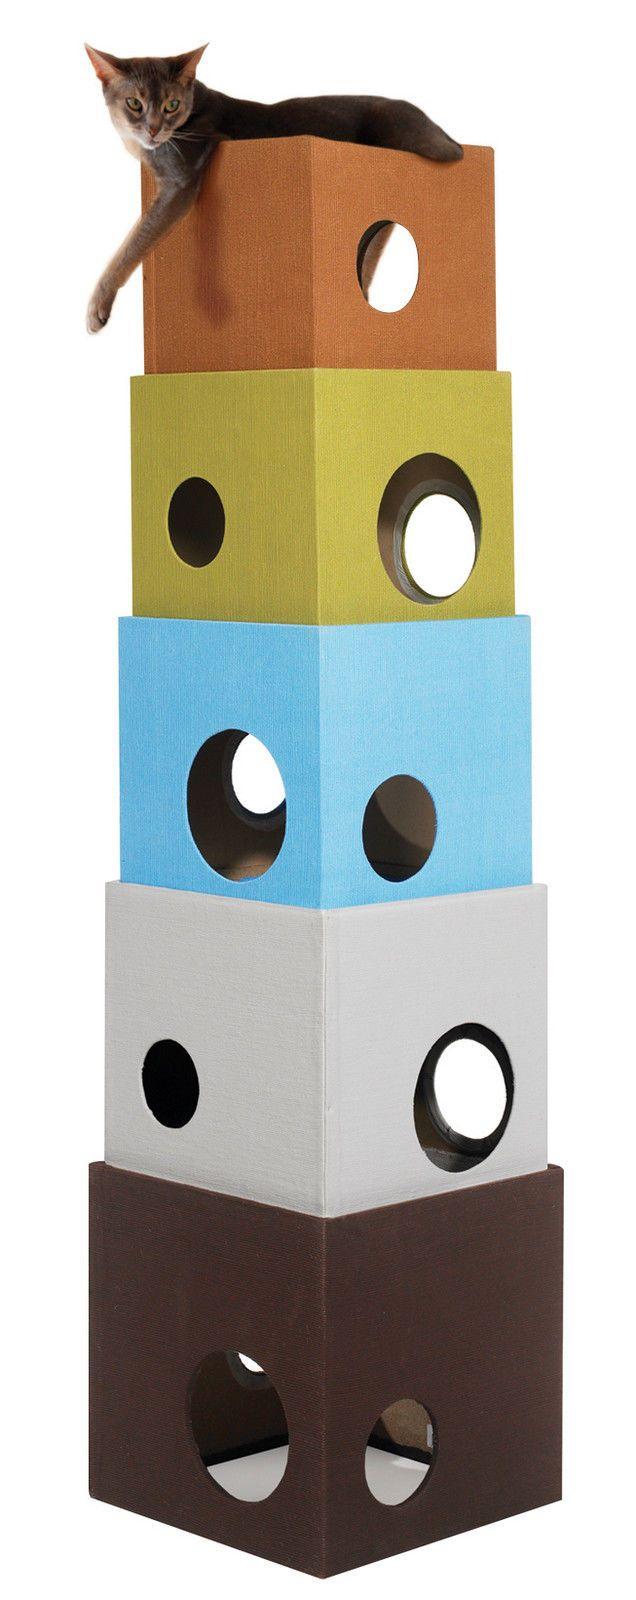 Kitty CAT Cube Tower CAT Tree Condo Scratcher Furniture | eBay